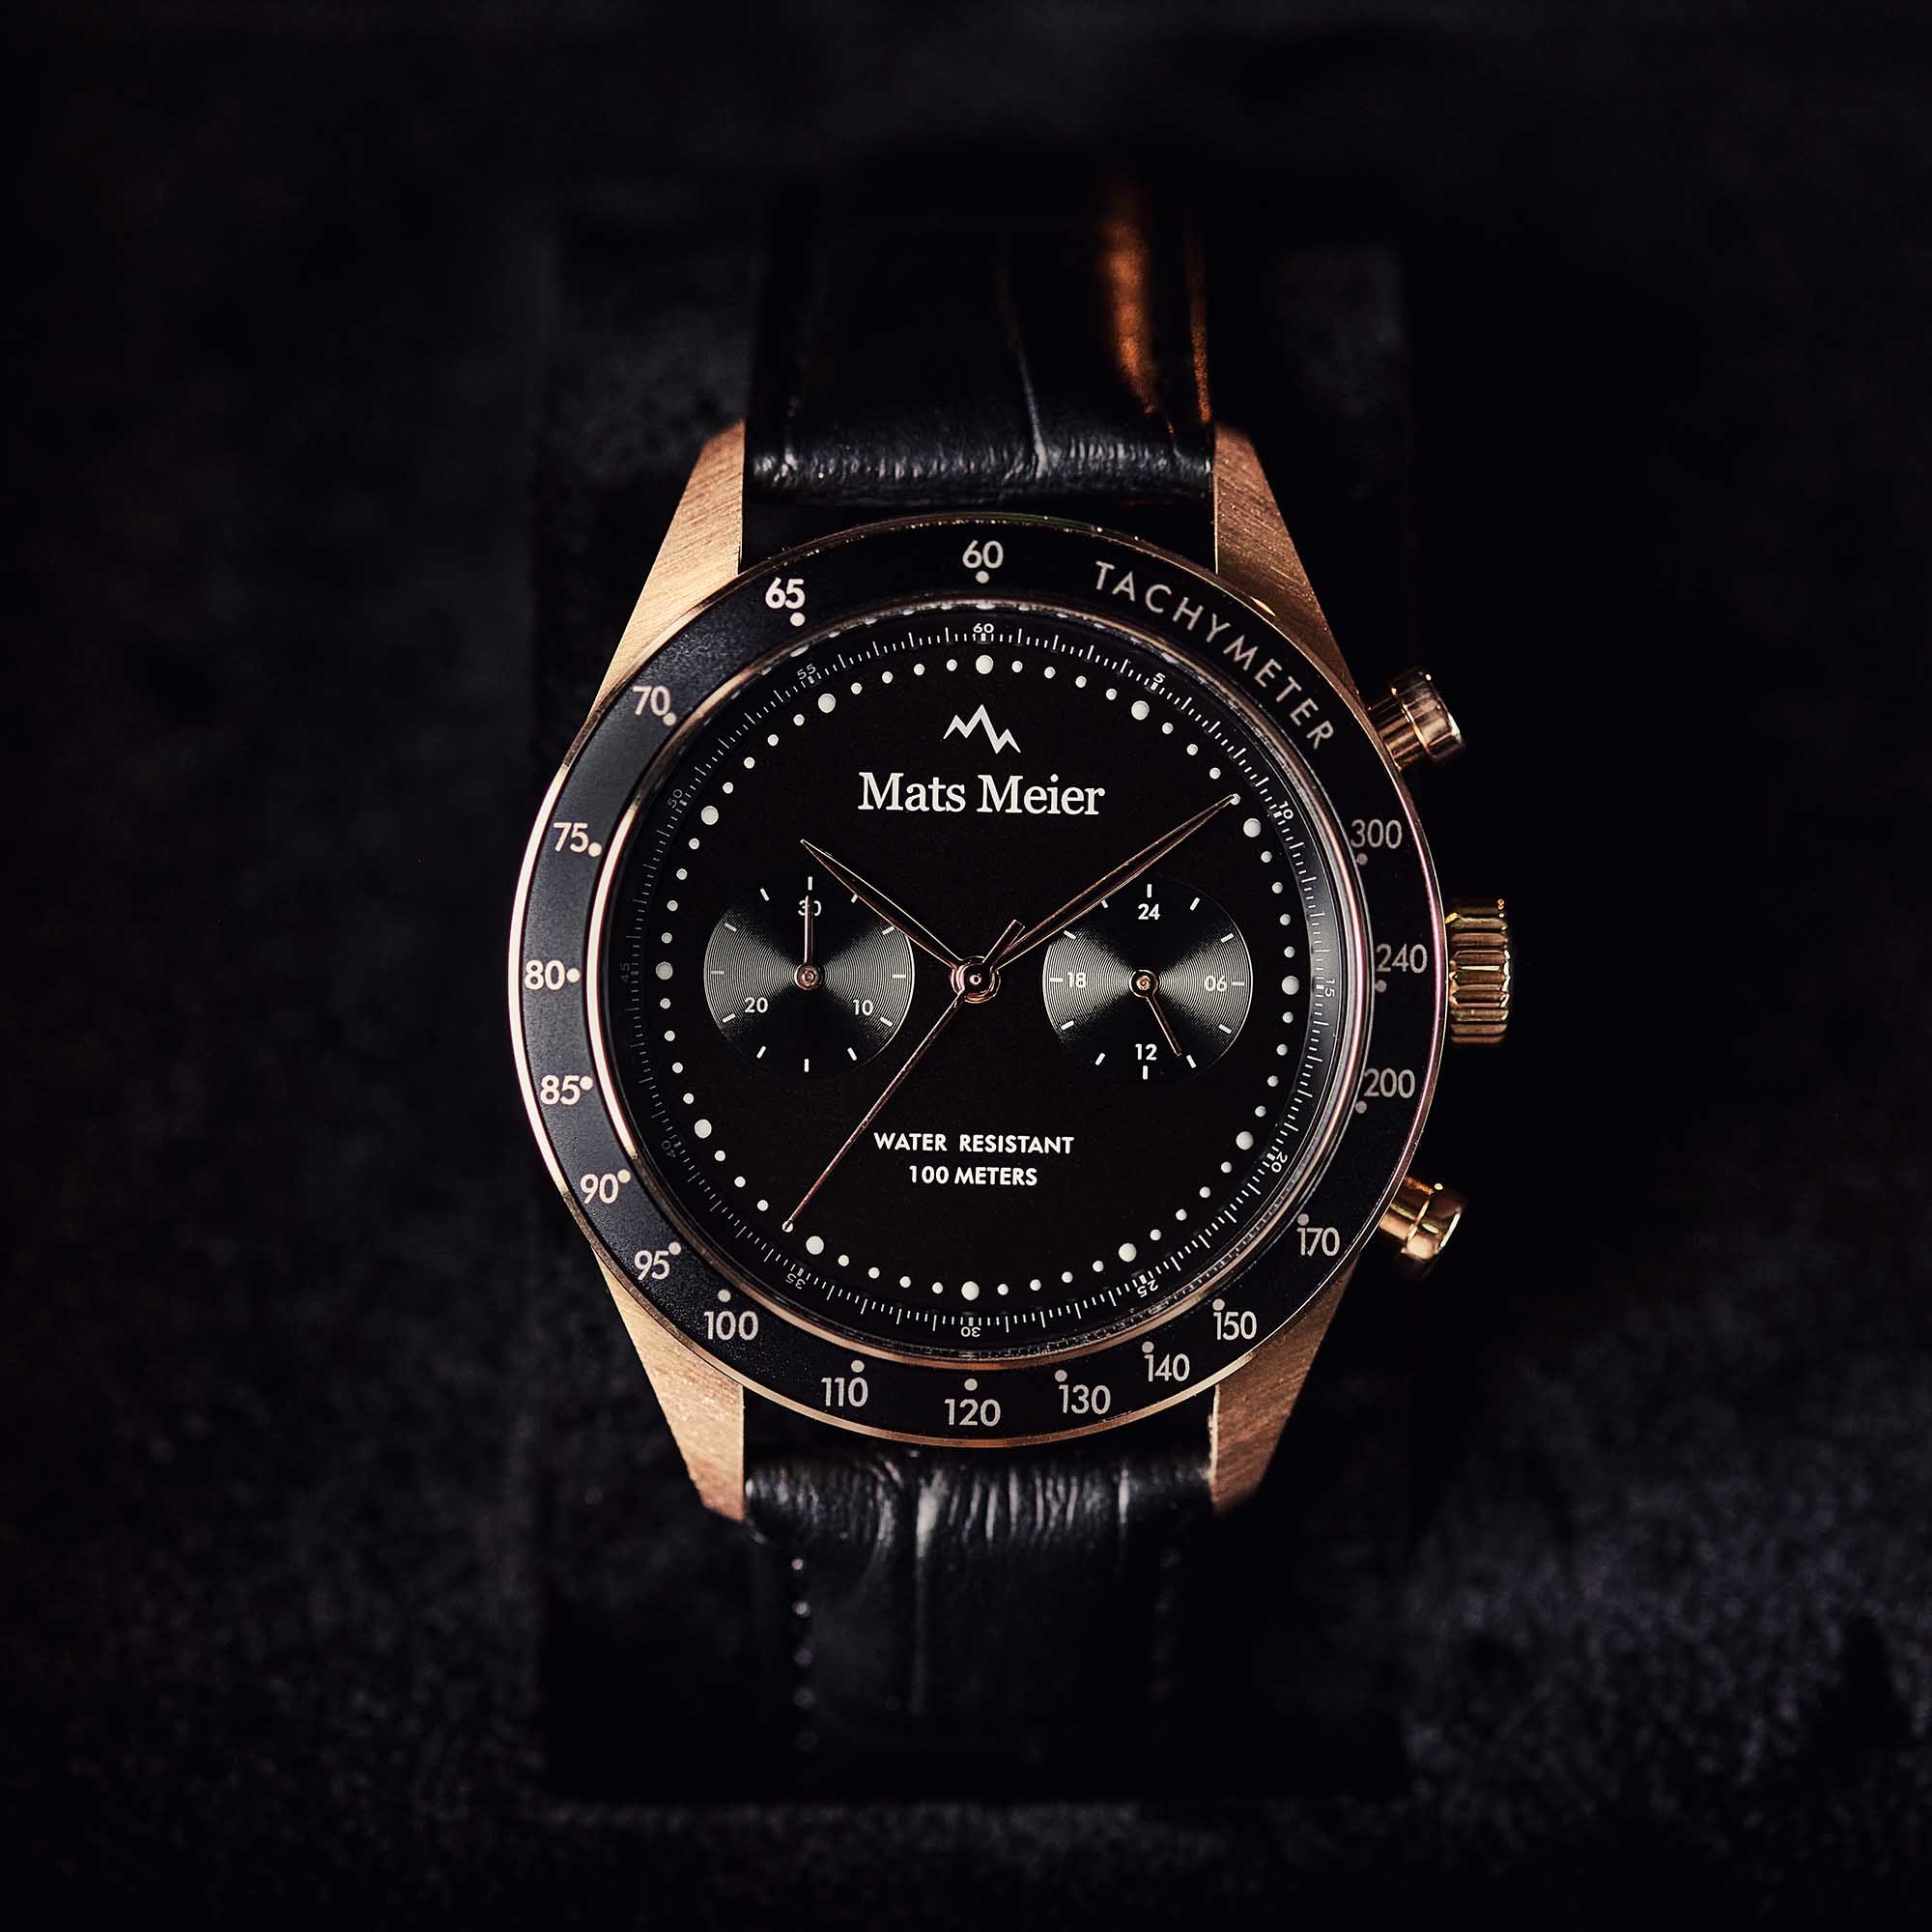 Mats Meier Arosa Racing Chronohraph watch black